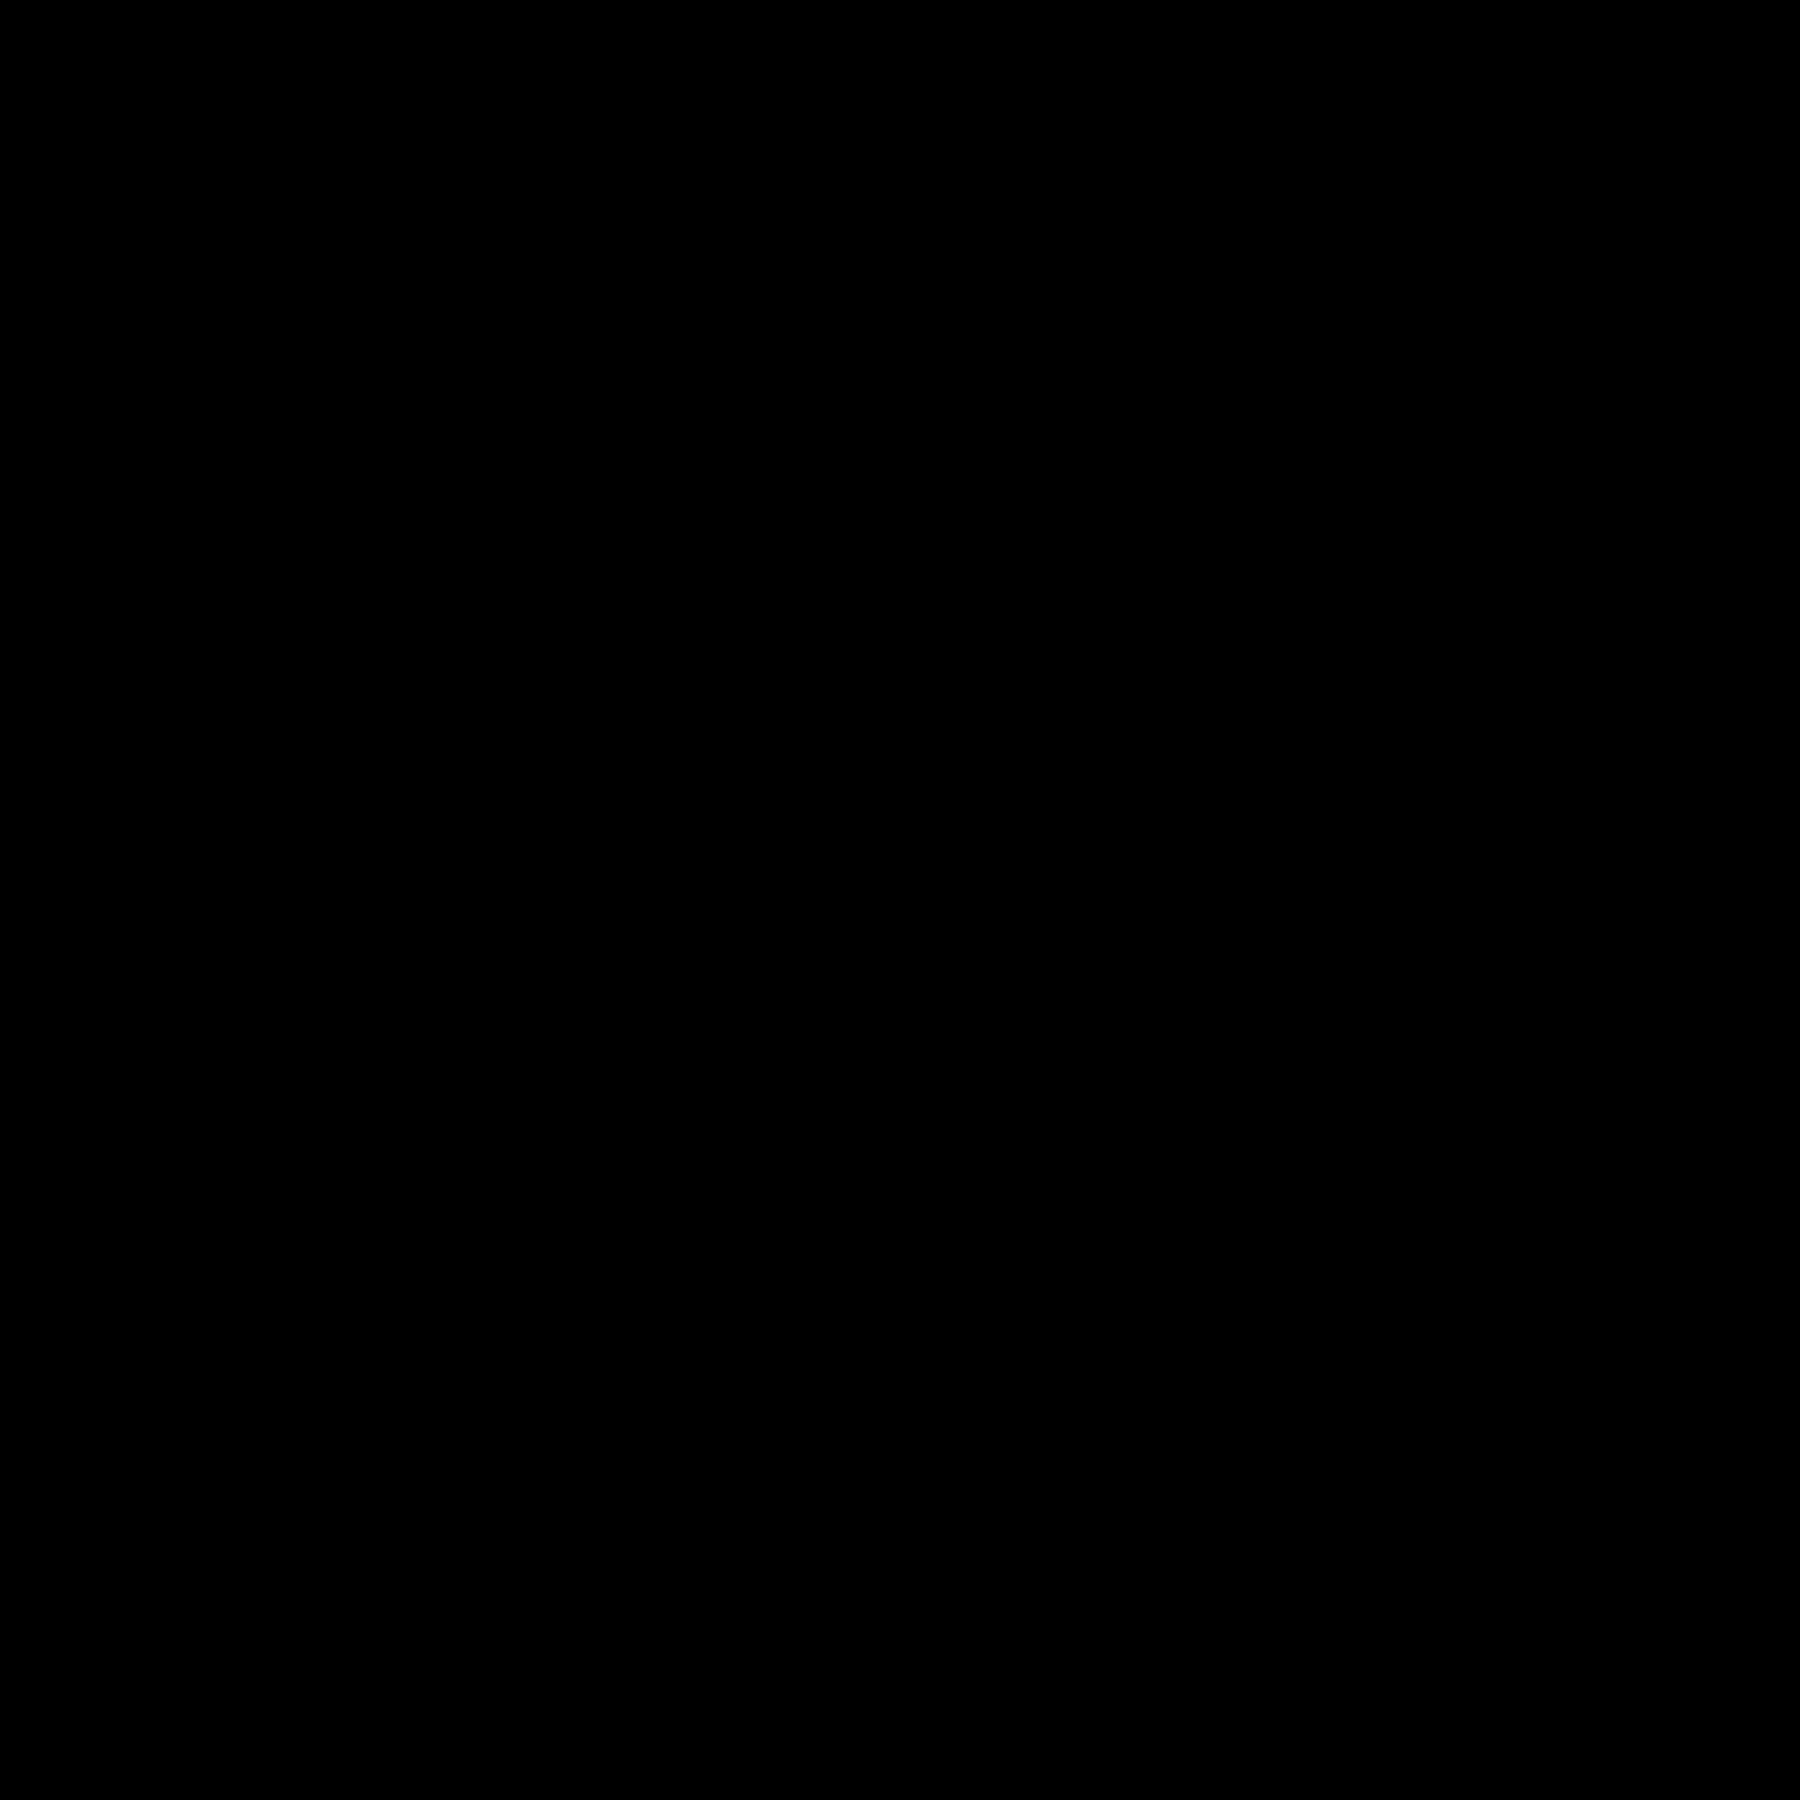 nva circle subheading black-01.png